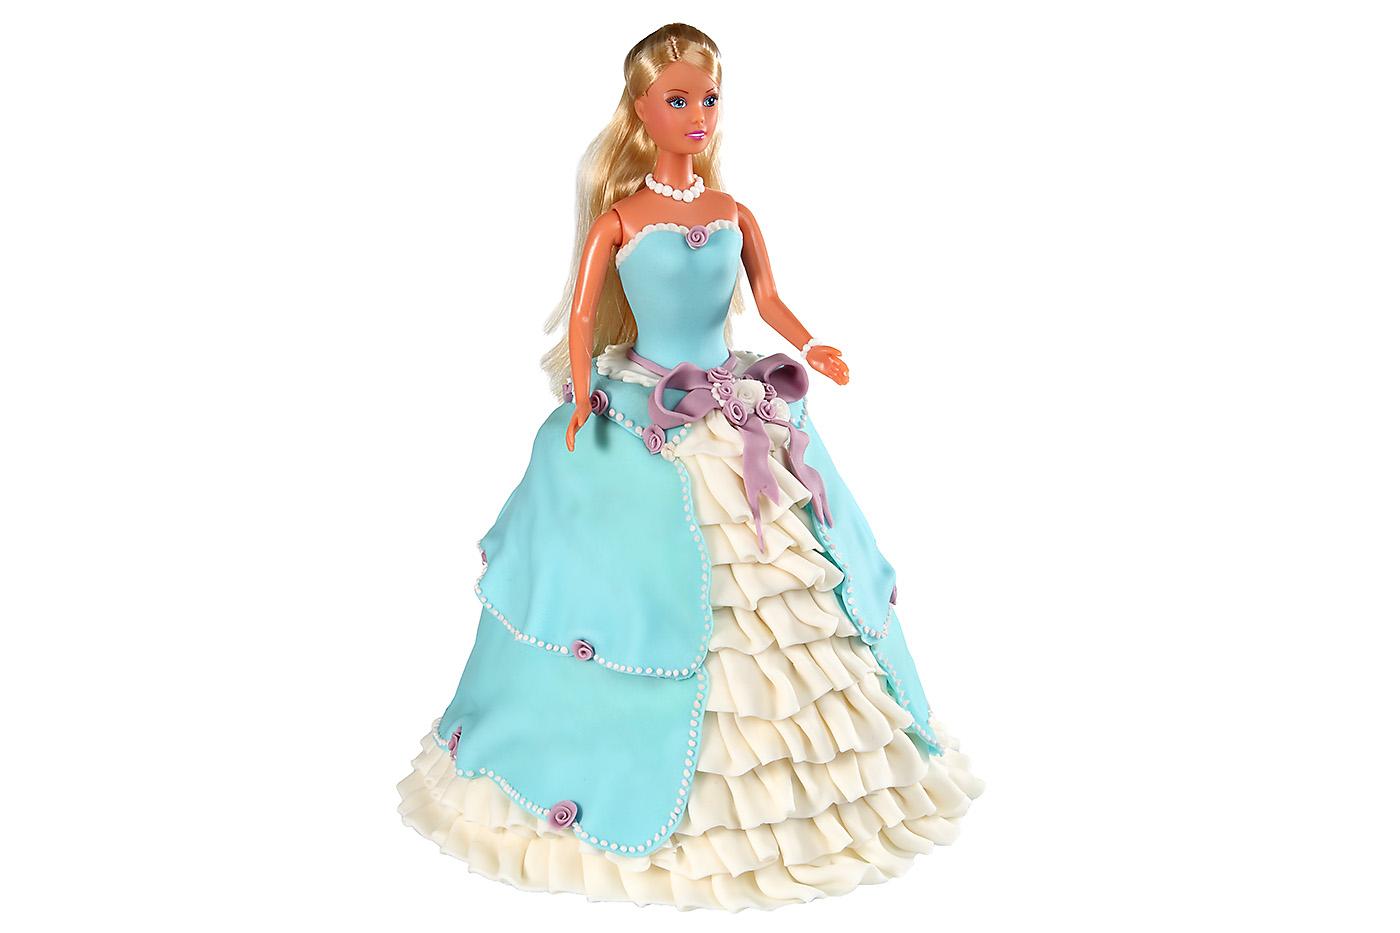 Torte_Prinzessin_1400px.jpg